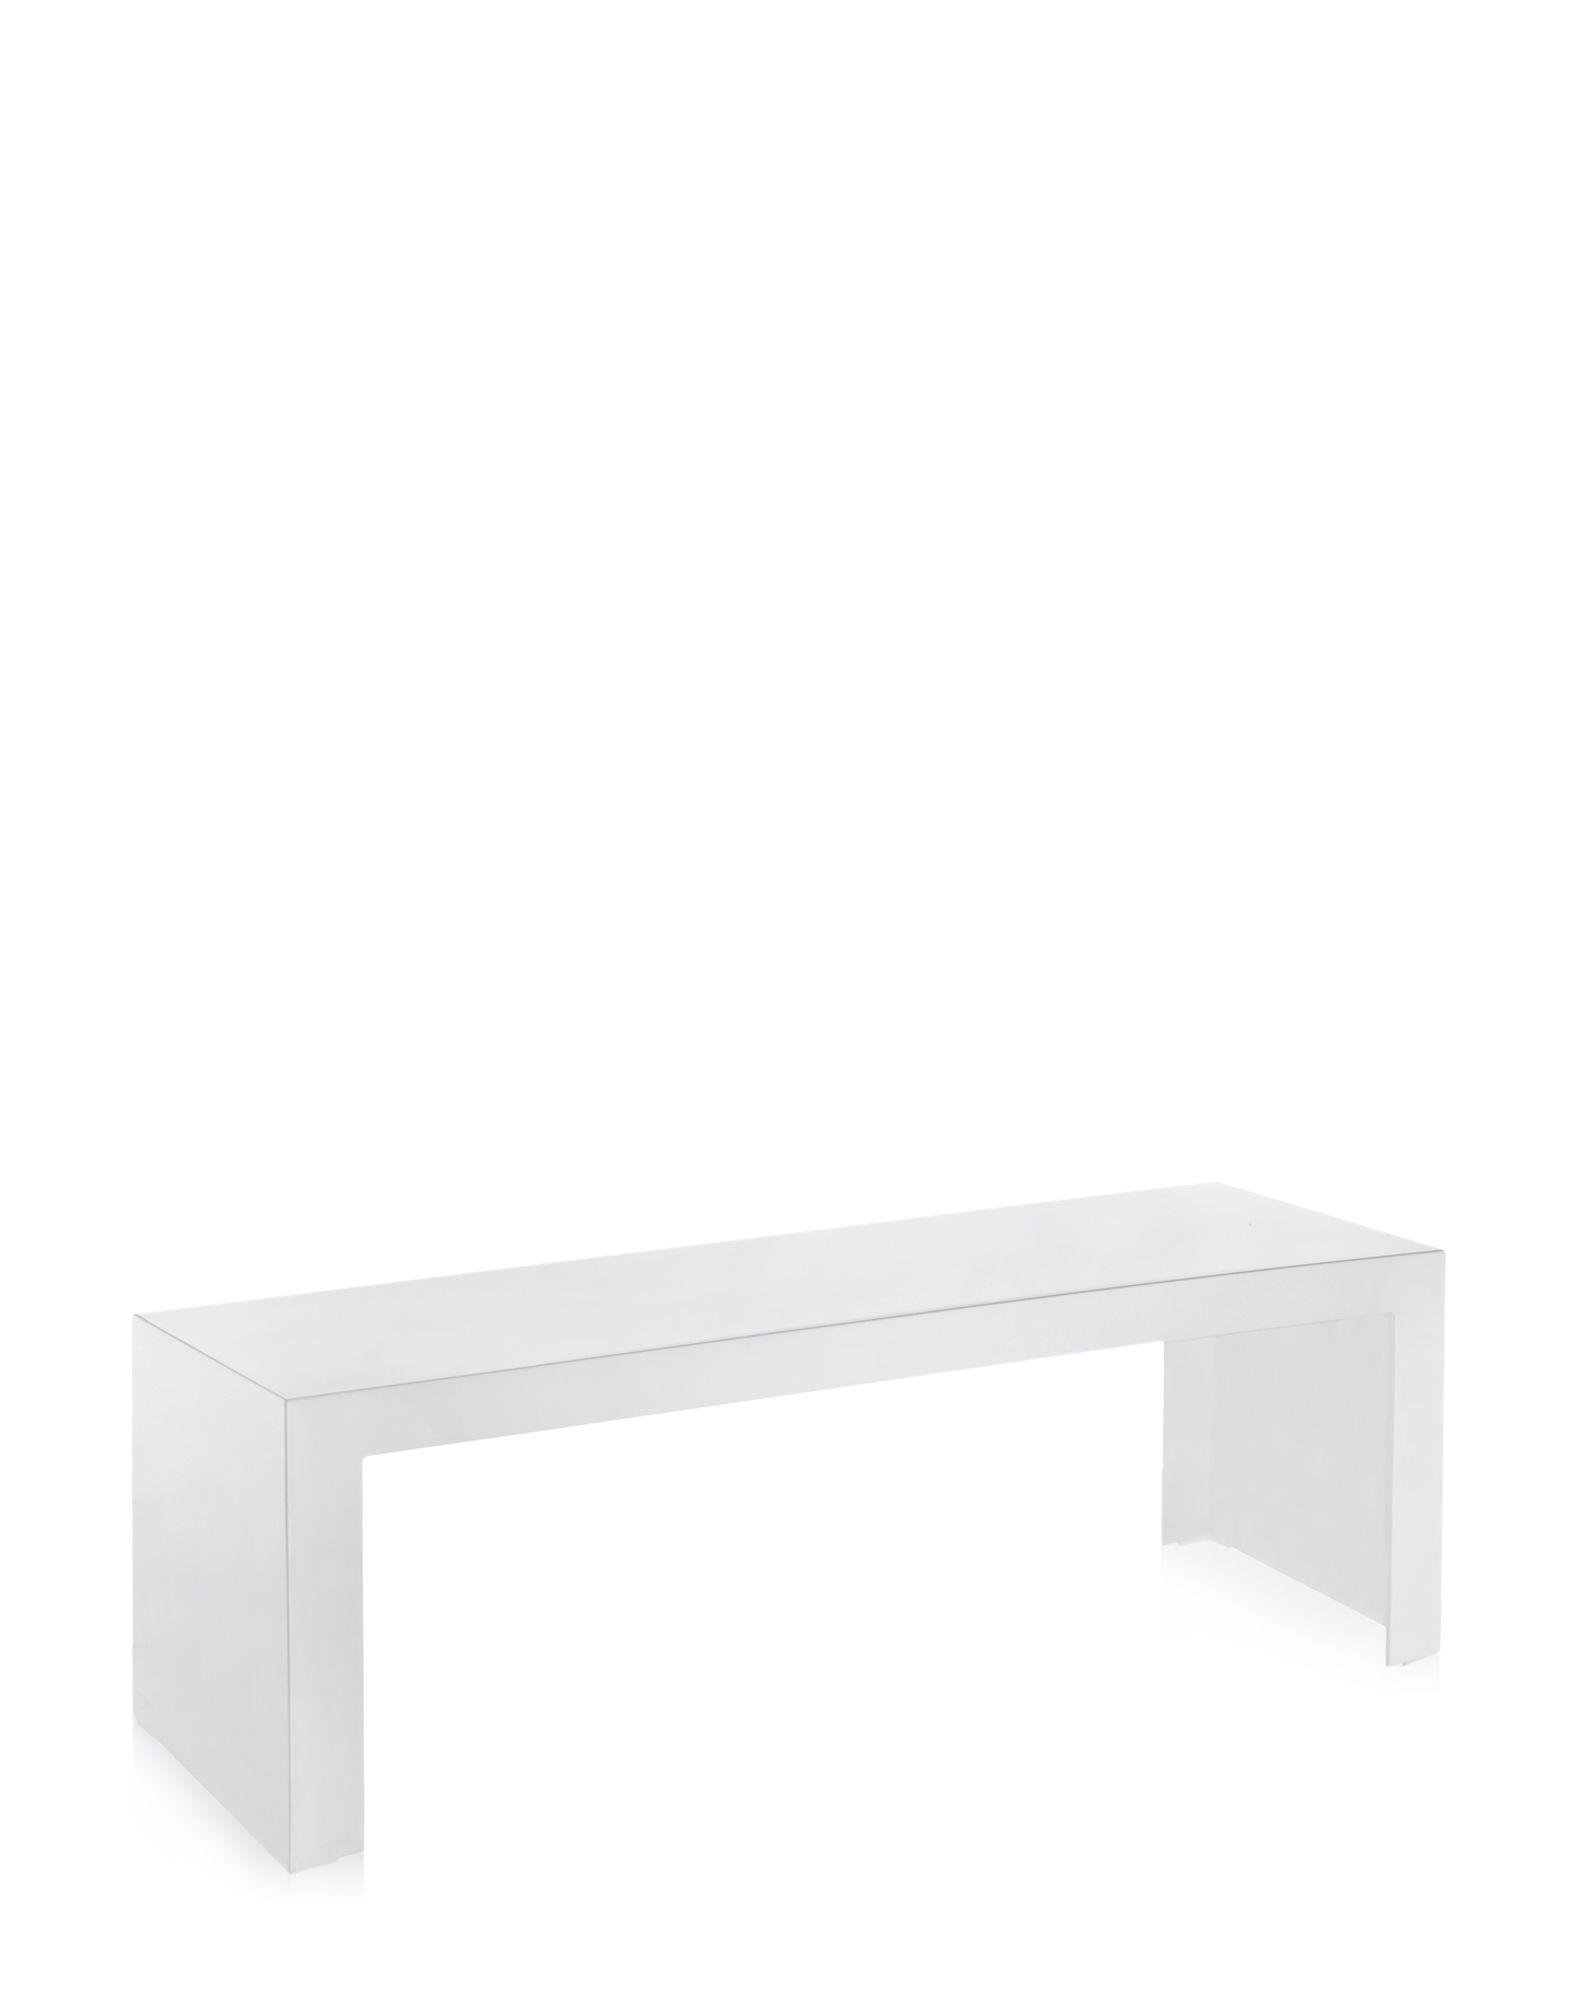 Side Table Kartell Invisible White Covering Rectangular H 40 Cm